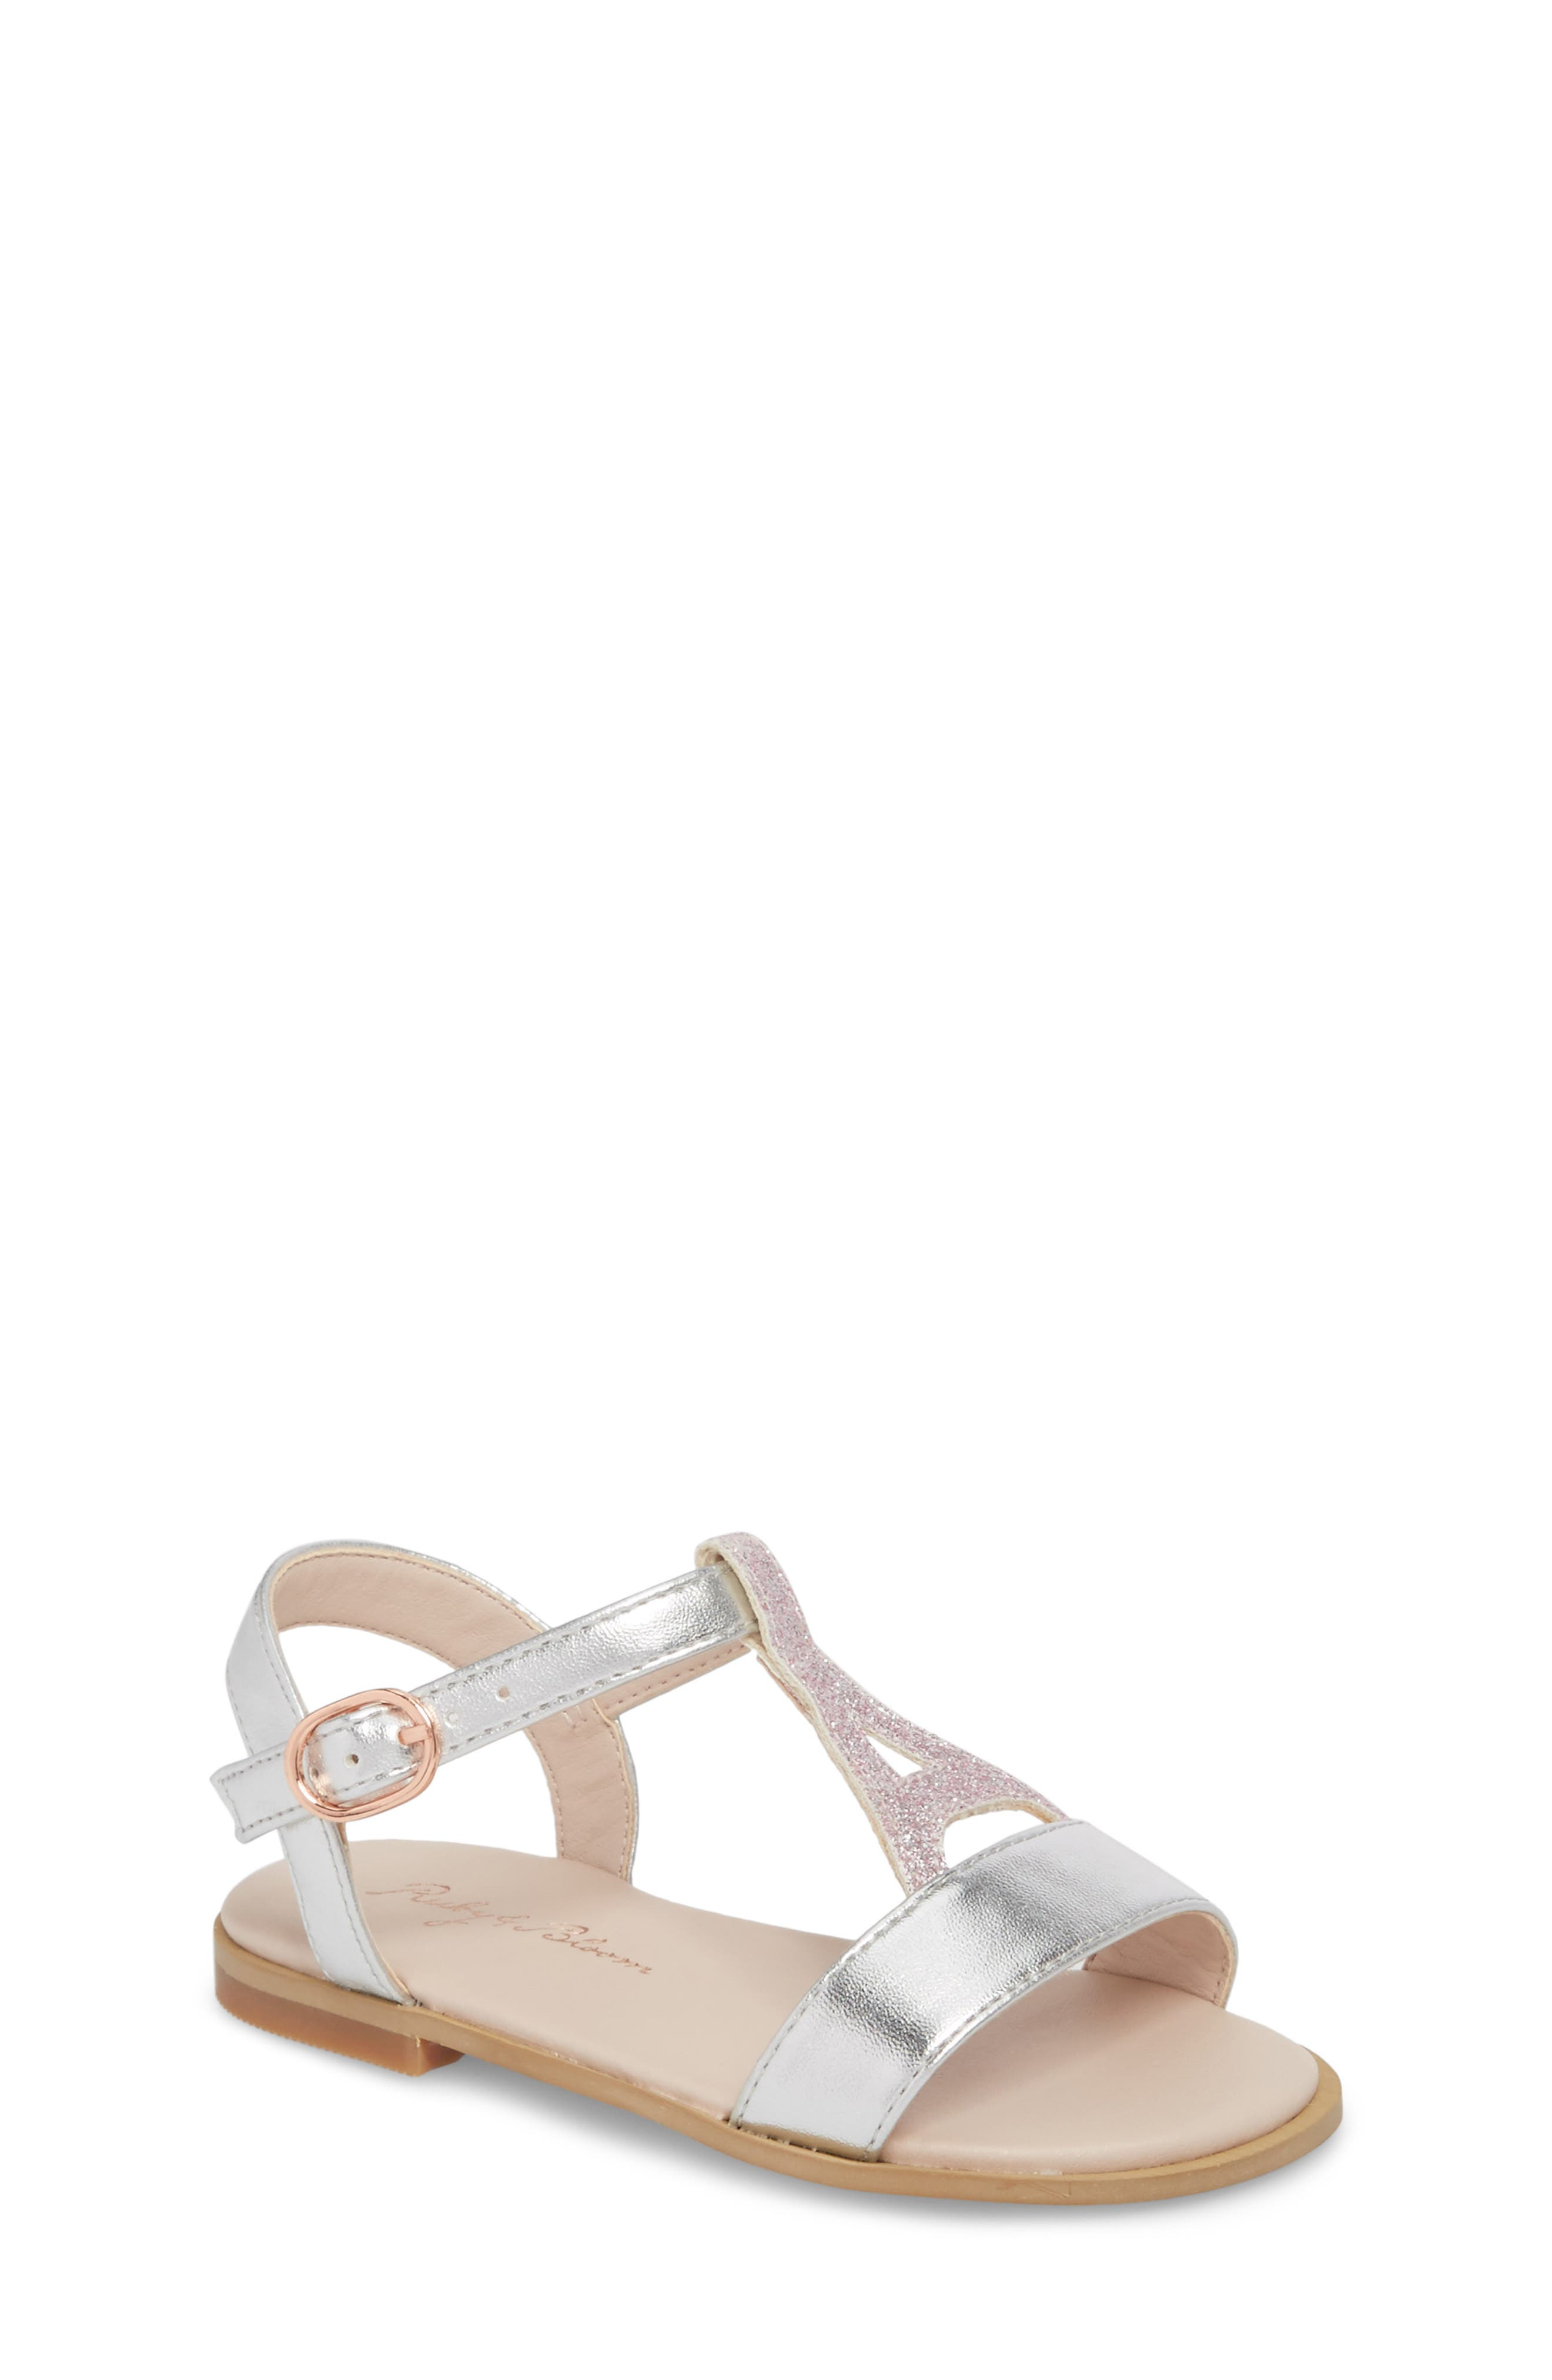 Tegan Glitter T-Strap Sandal,                         Main,                         color, Silver Faux Leather